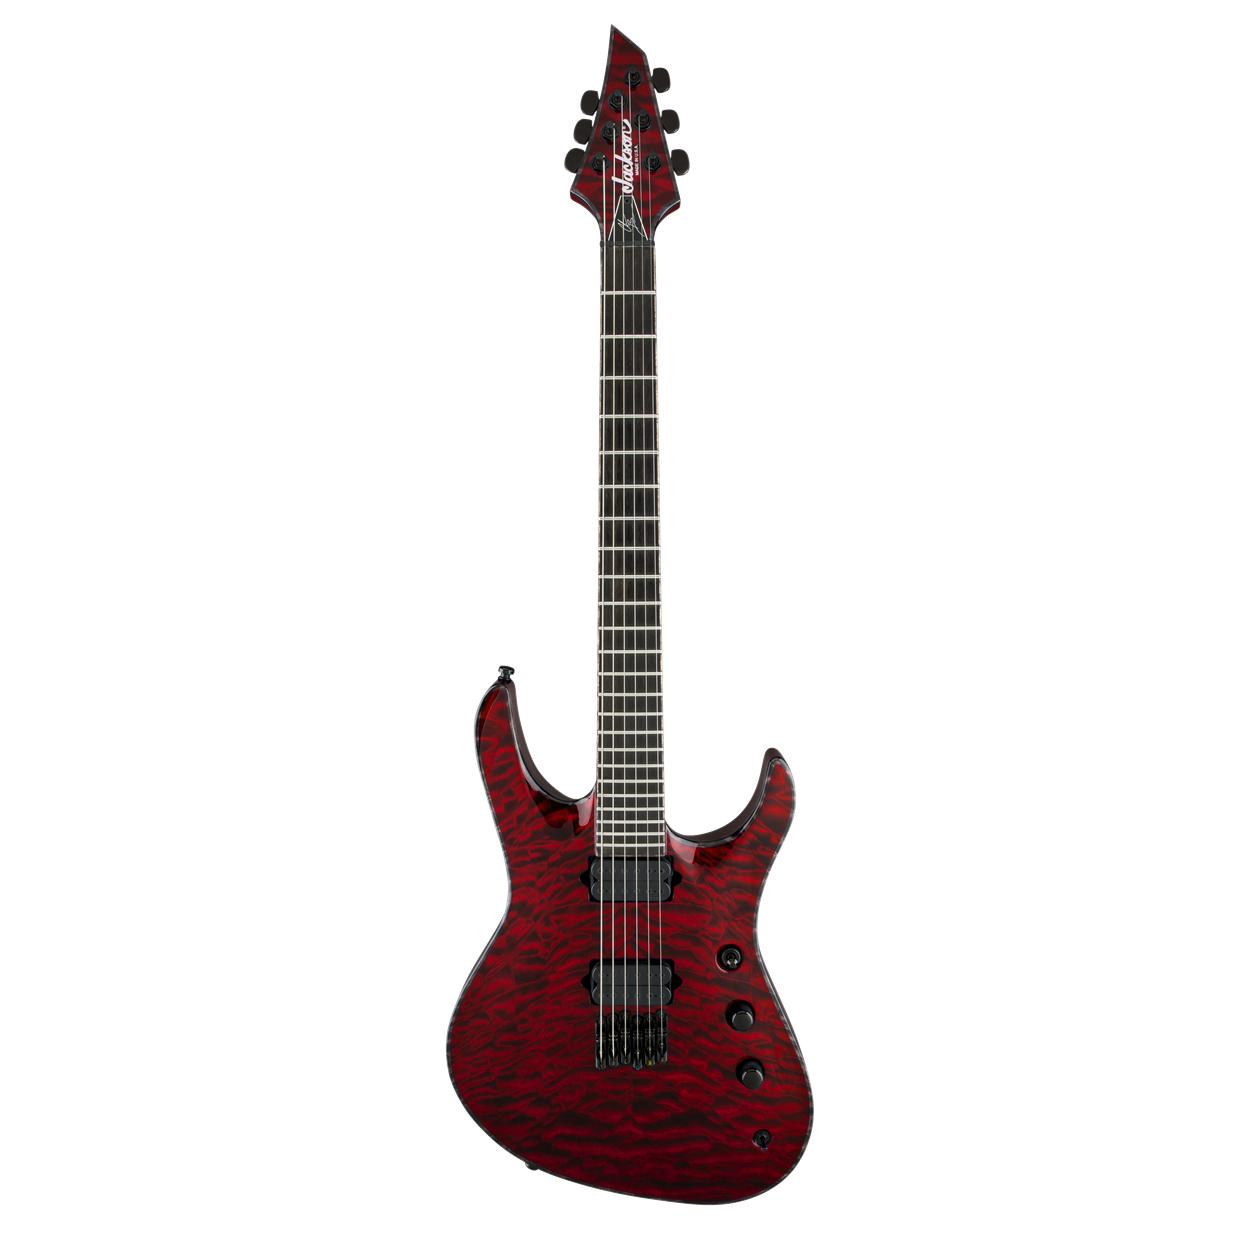 USA Signature Chris Broderick Soloist™ HT6 Transparent Red_01